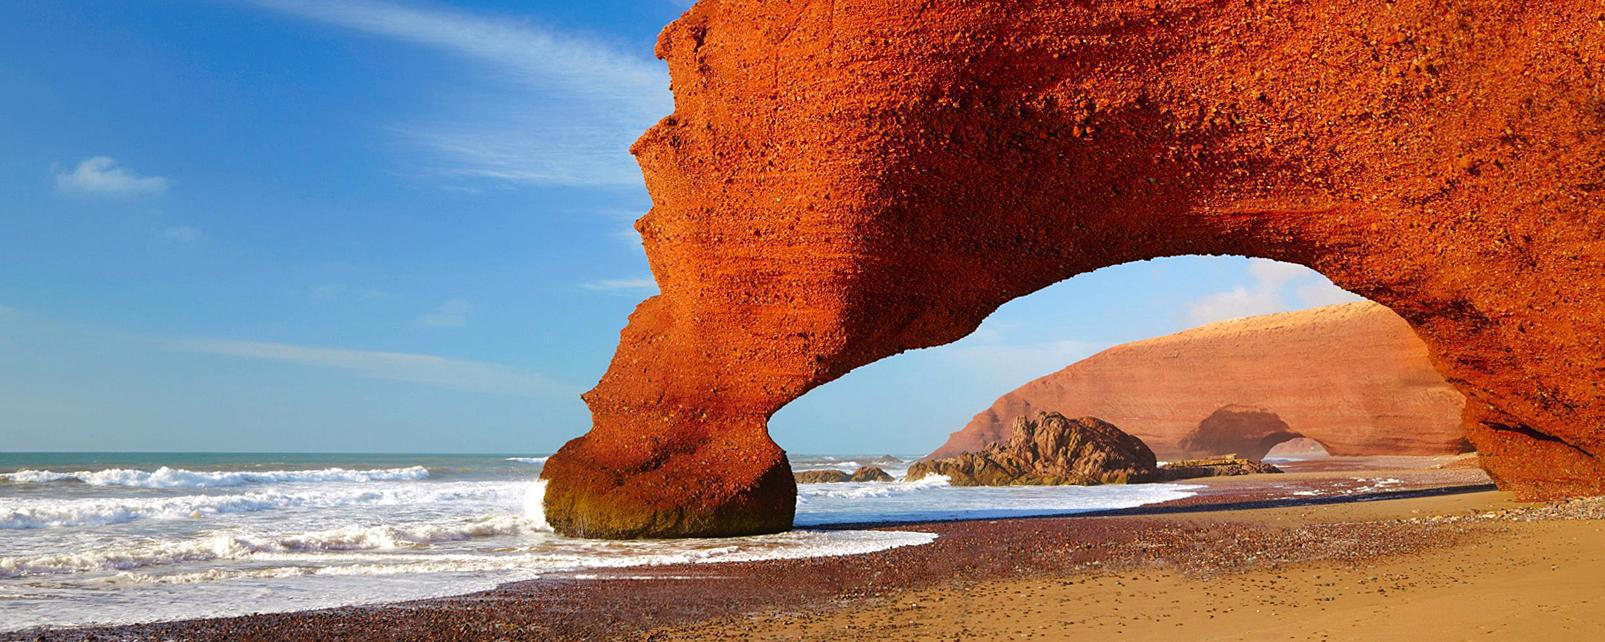 Afrique, Maroc, plage, Atlantique, baignade, roche, arche,